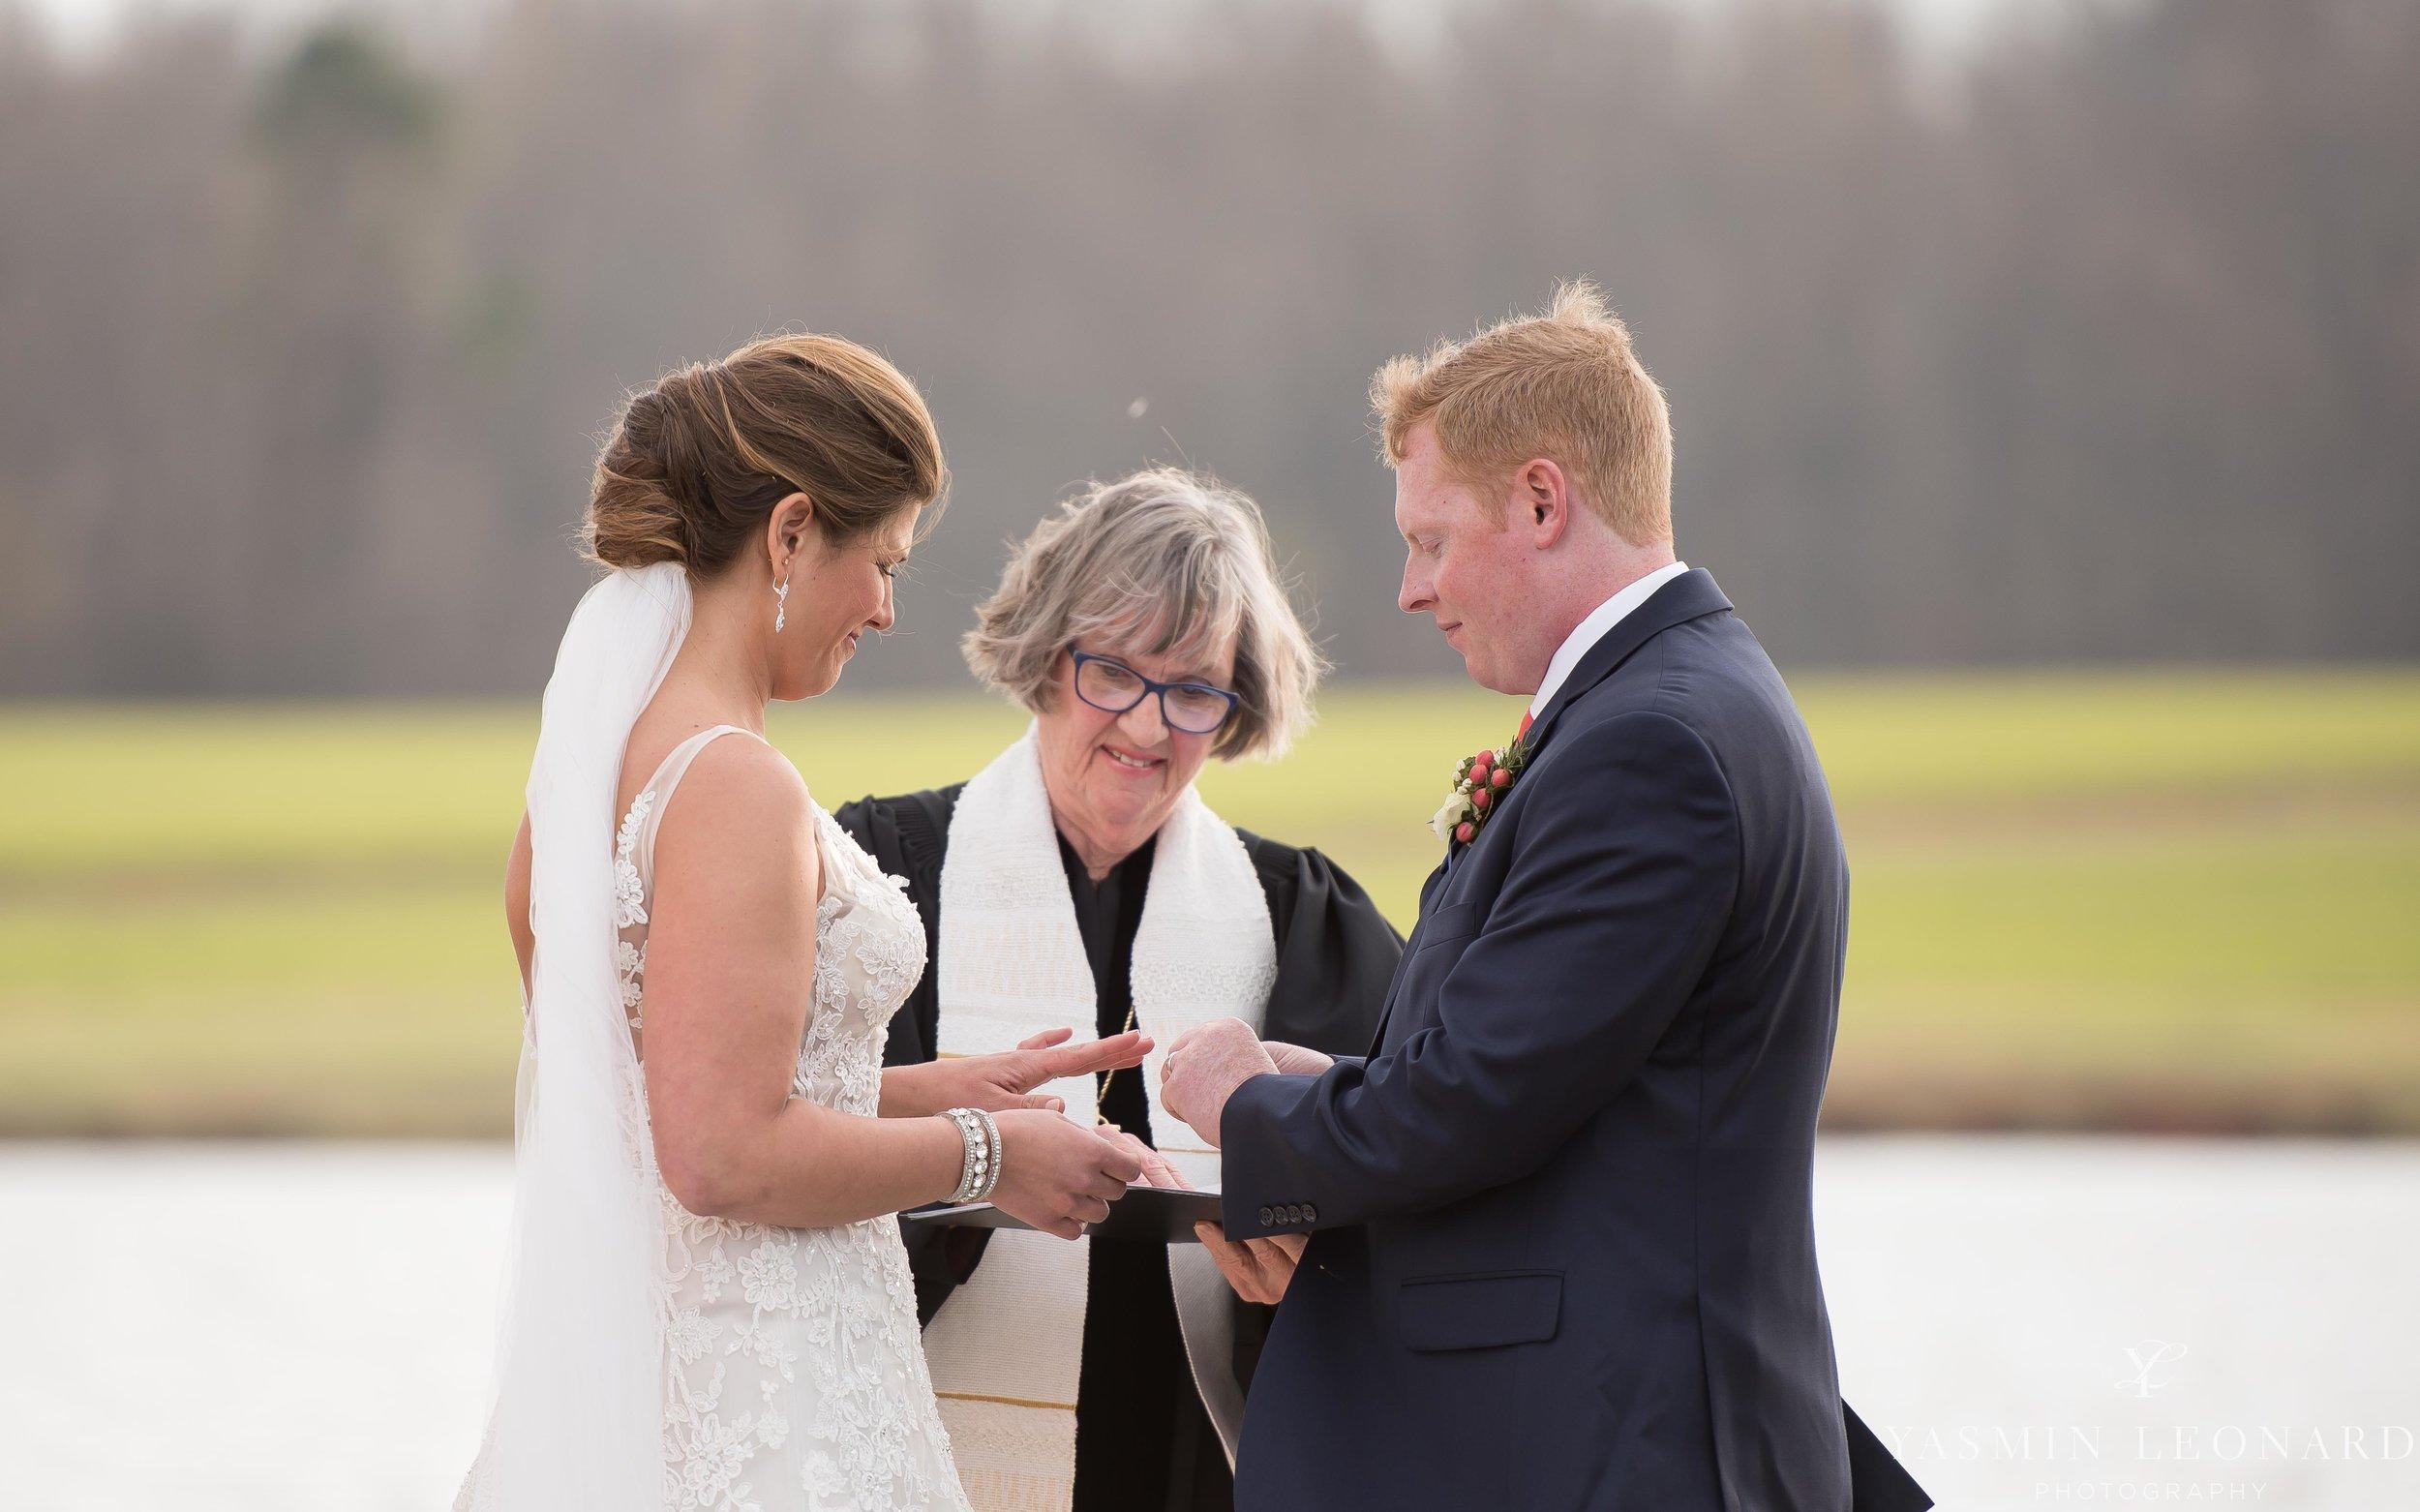 Adaumont Farm - Adaumont Farm Weddings - Trinity Weddings - NC Weddings - Yasmin Leonard Photography-35.jpg